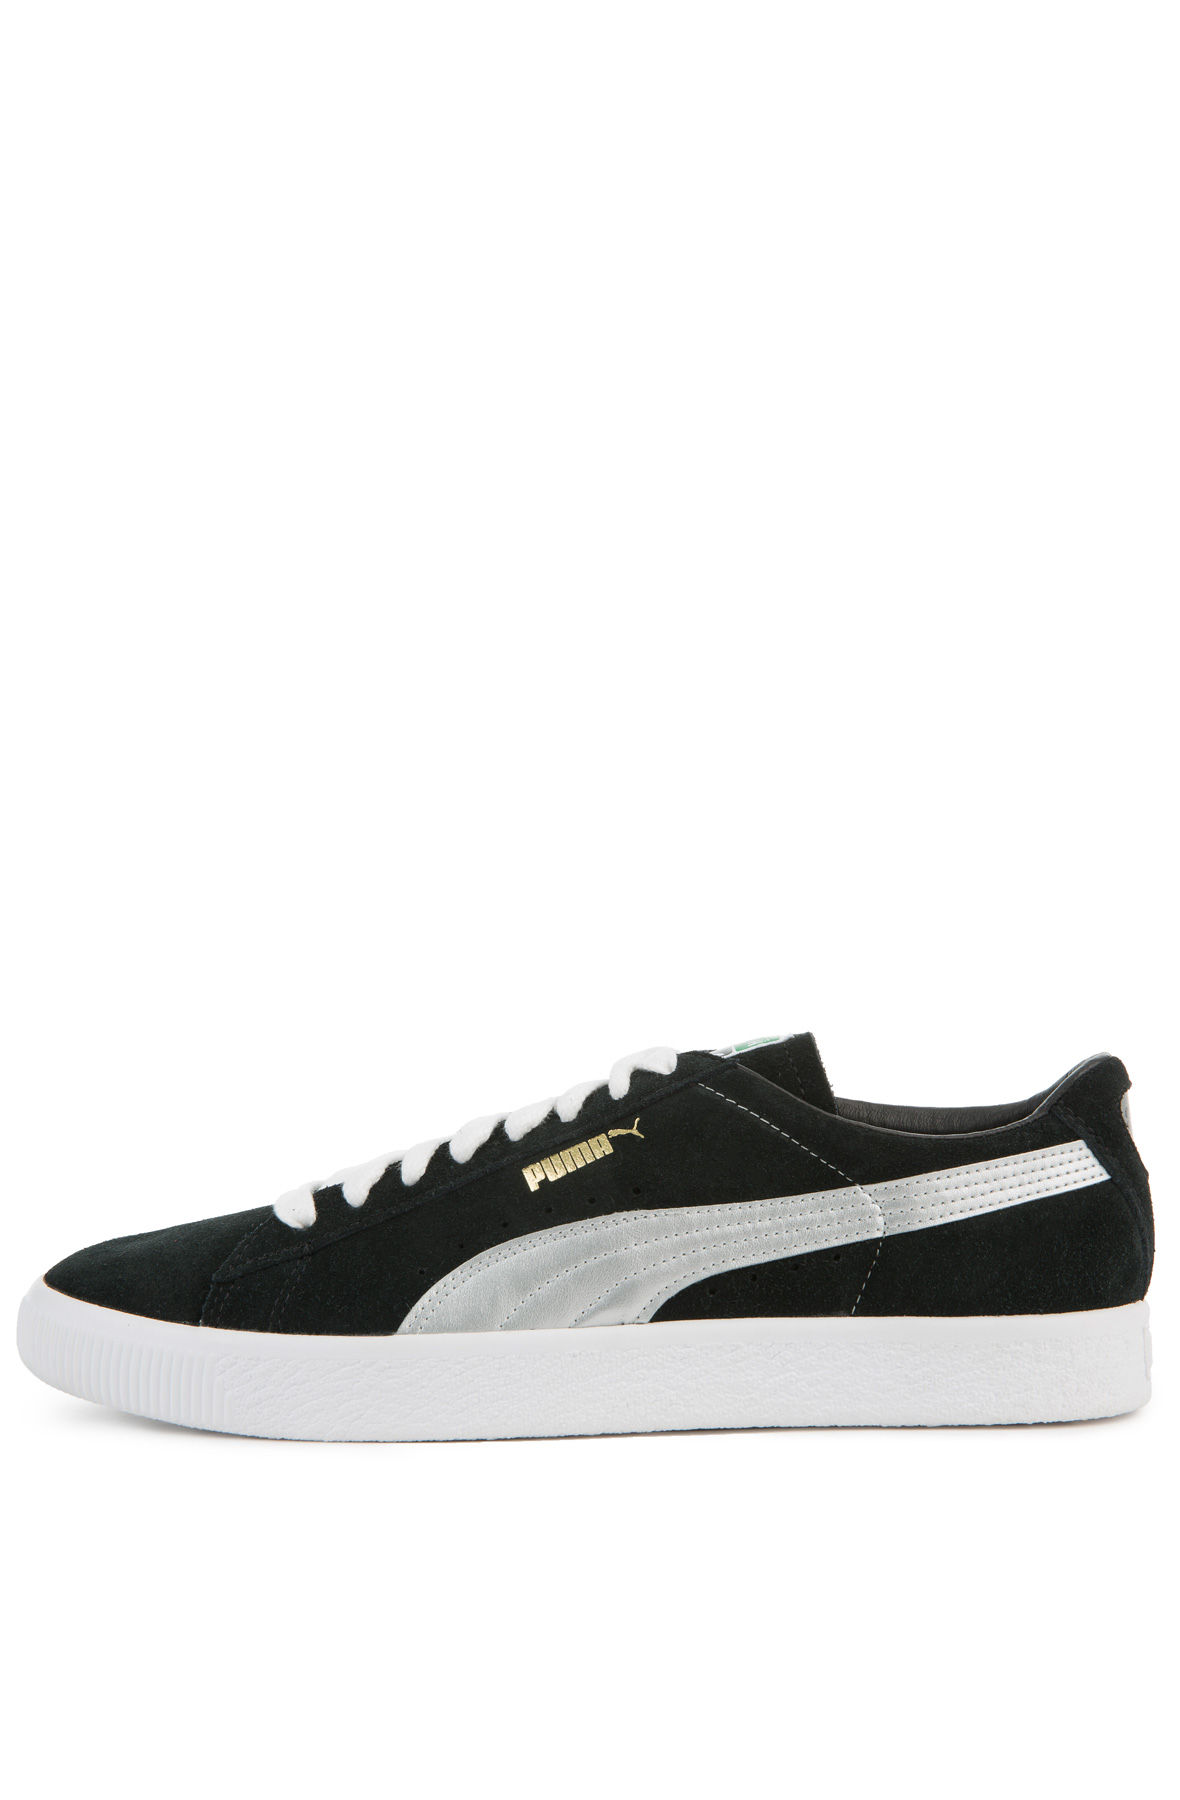 silver puma sneakers